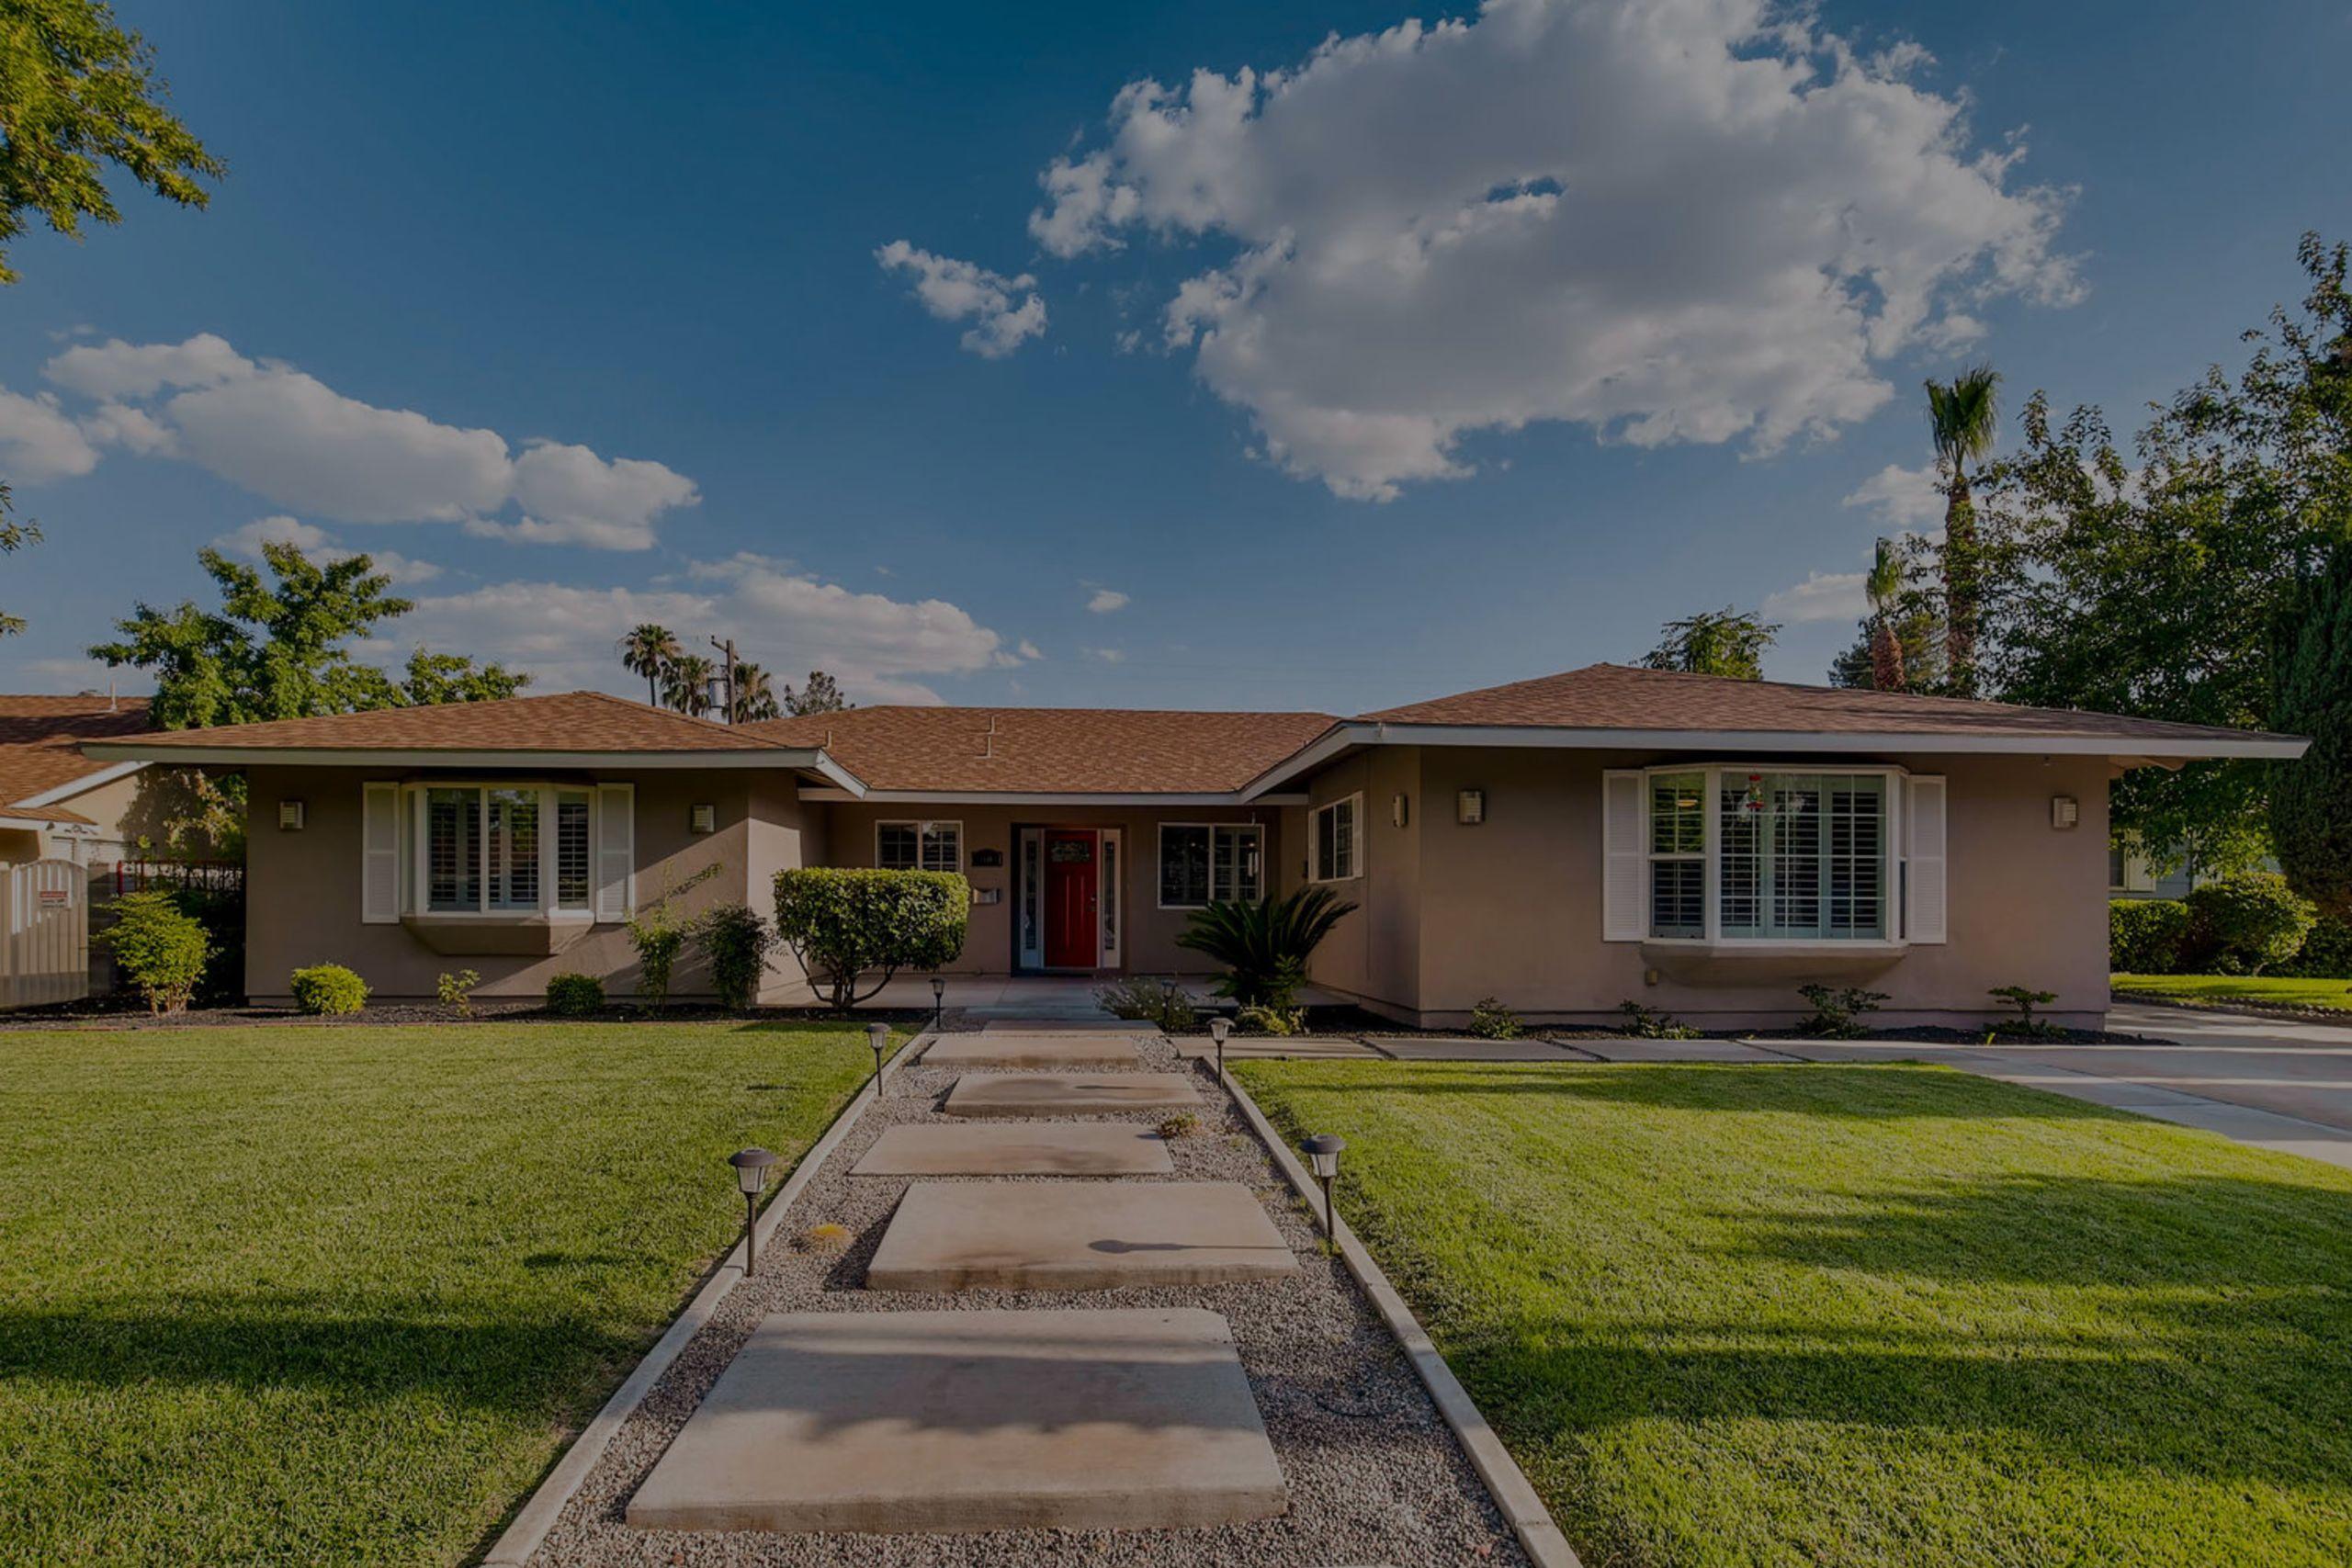 2909 Bryant Ave – McNeil Estates